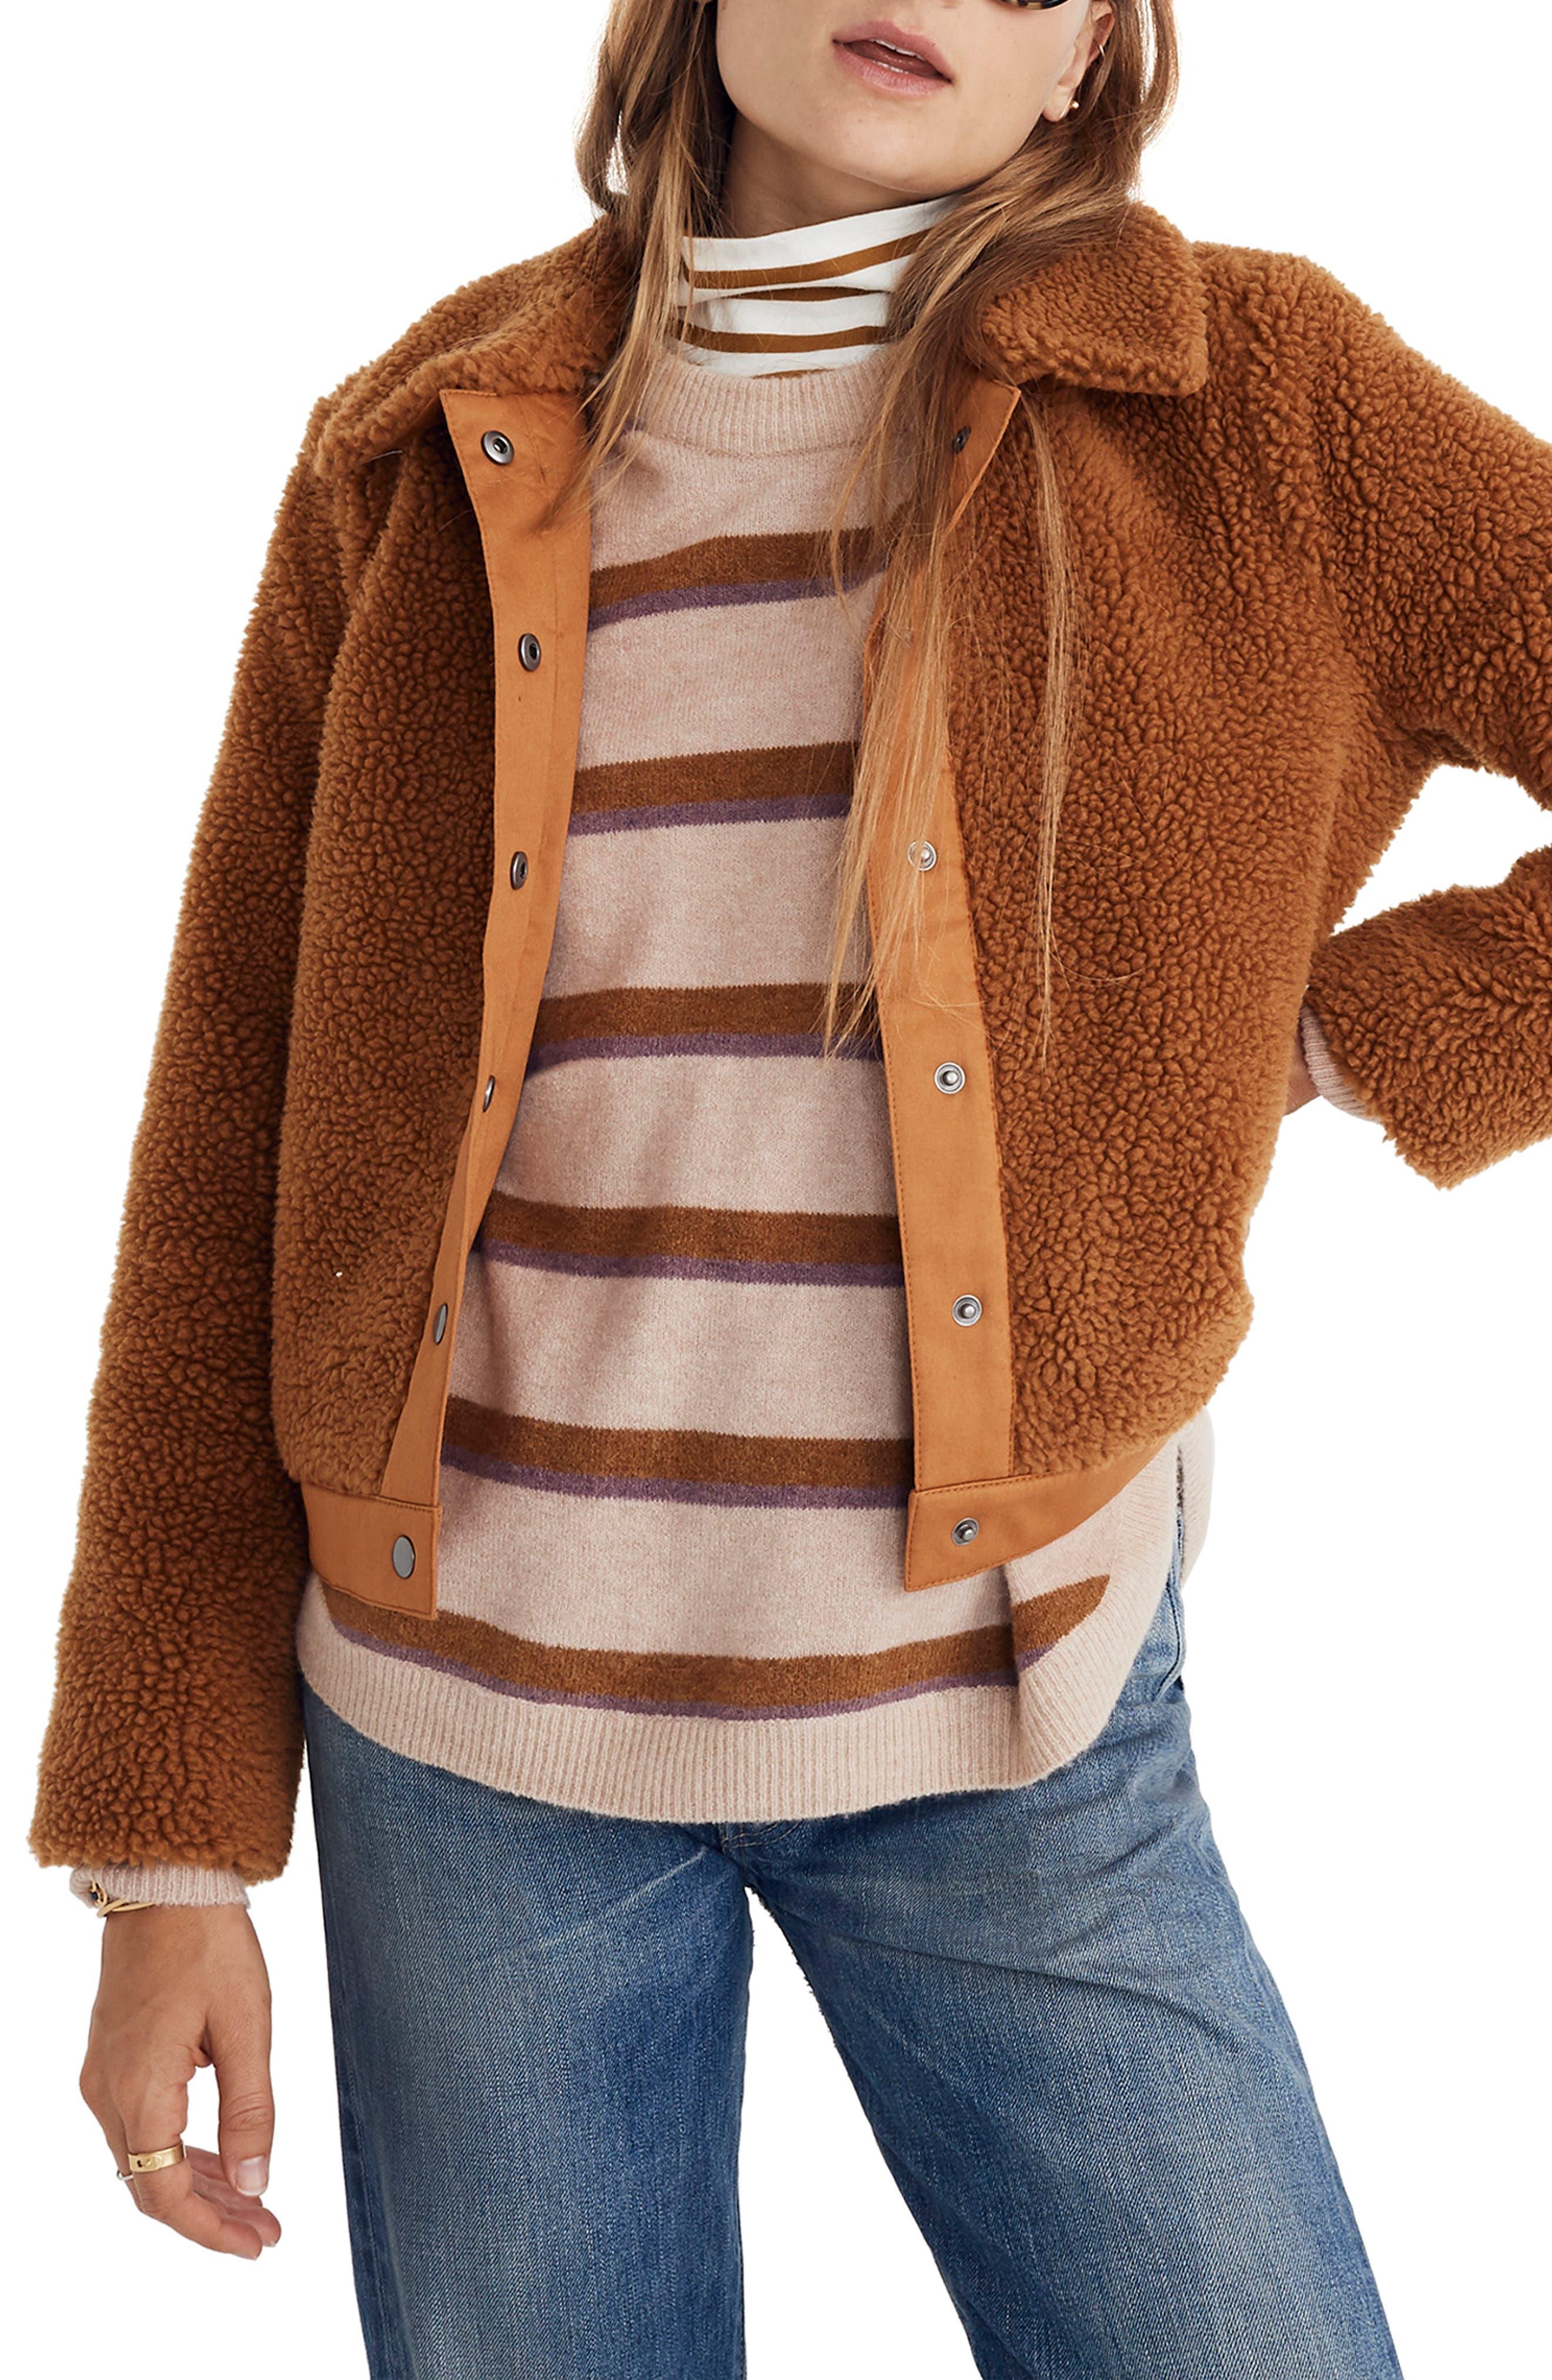 Portland Fleece Jacket,                             Main thumbnail 1, color,                             GOLDEN PECAN